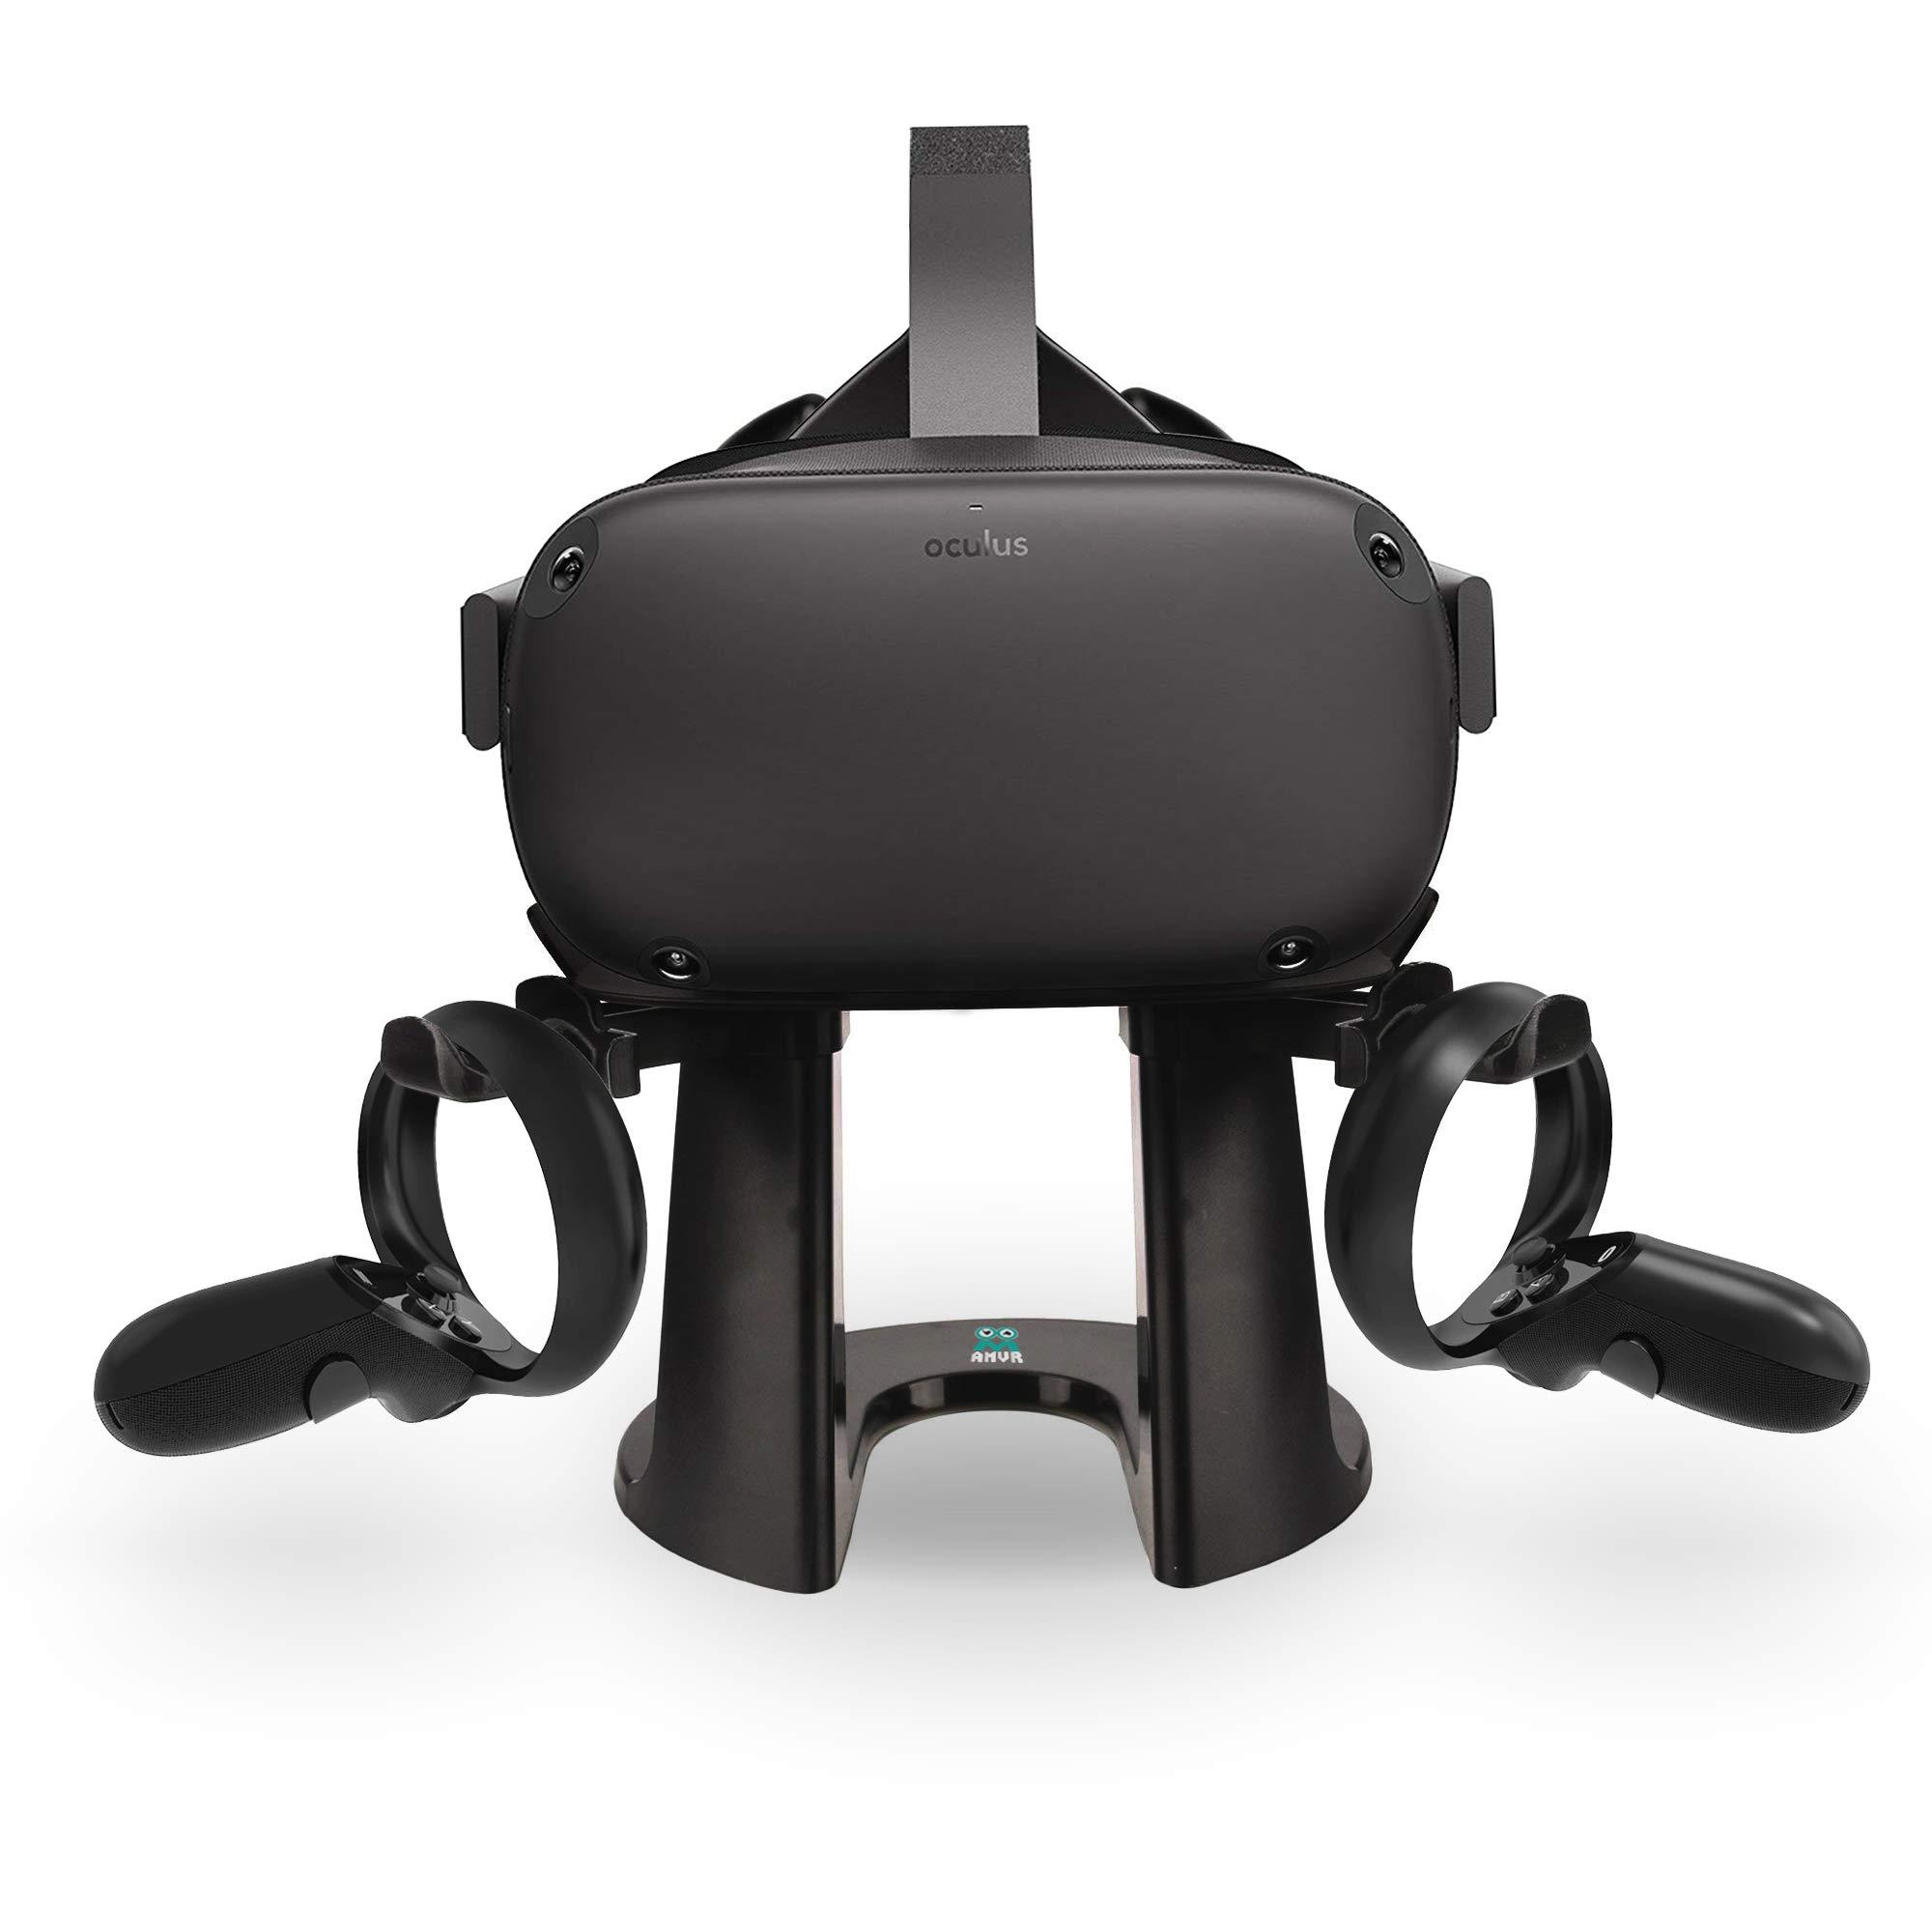 AMVR Pied VR pour Oculus Rift S/Oculus Quest Headset et Touch Controller